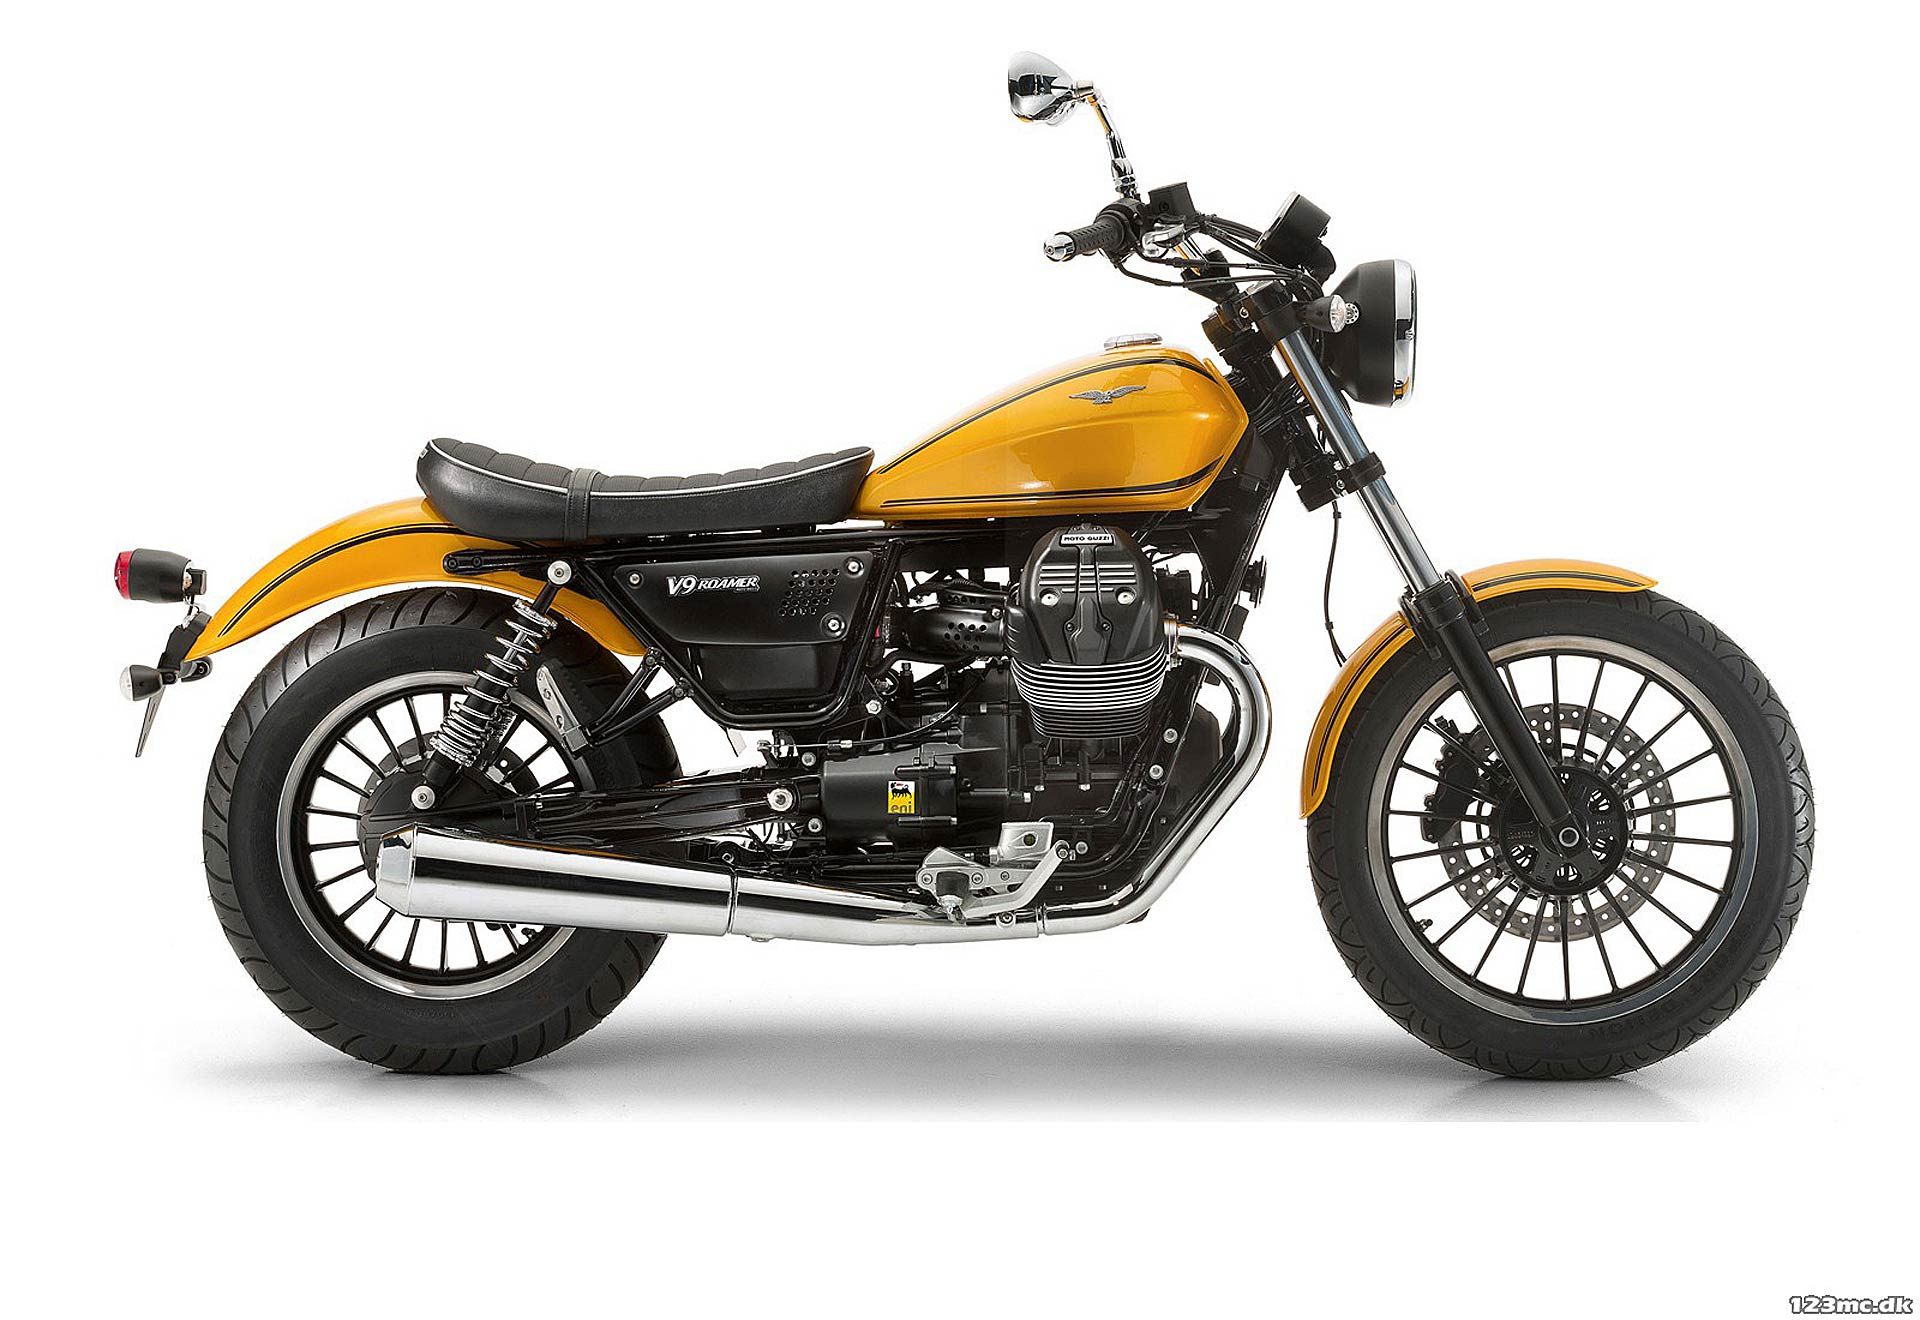 La Moto Guzzi V9 Roamer in livrea gialla